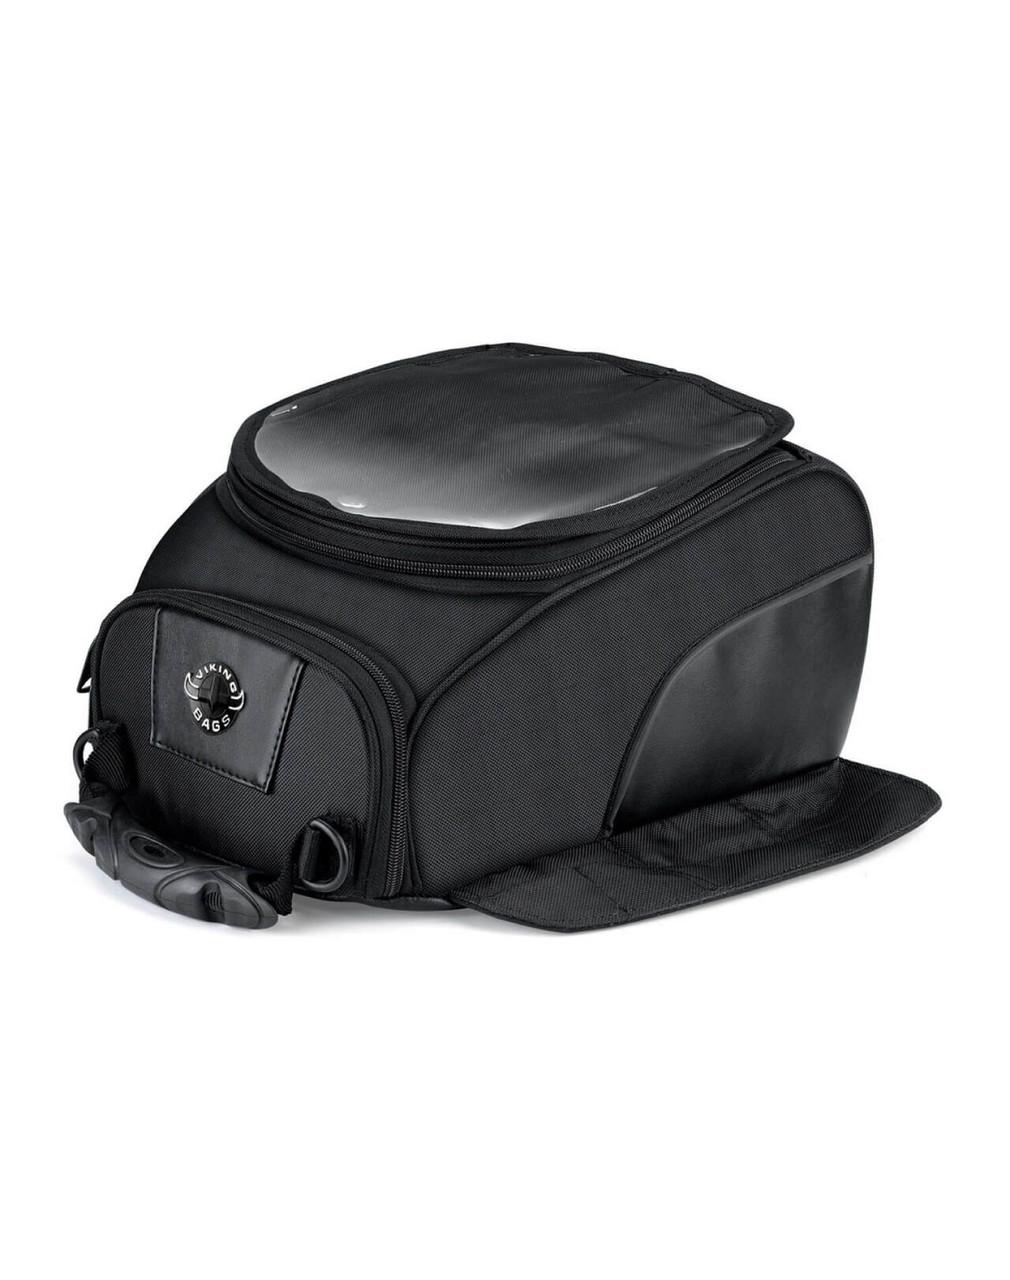 VikingBags 14 Large Indian Magnetic Motorcycle Tank Bag Main Bag View